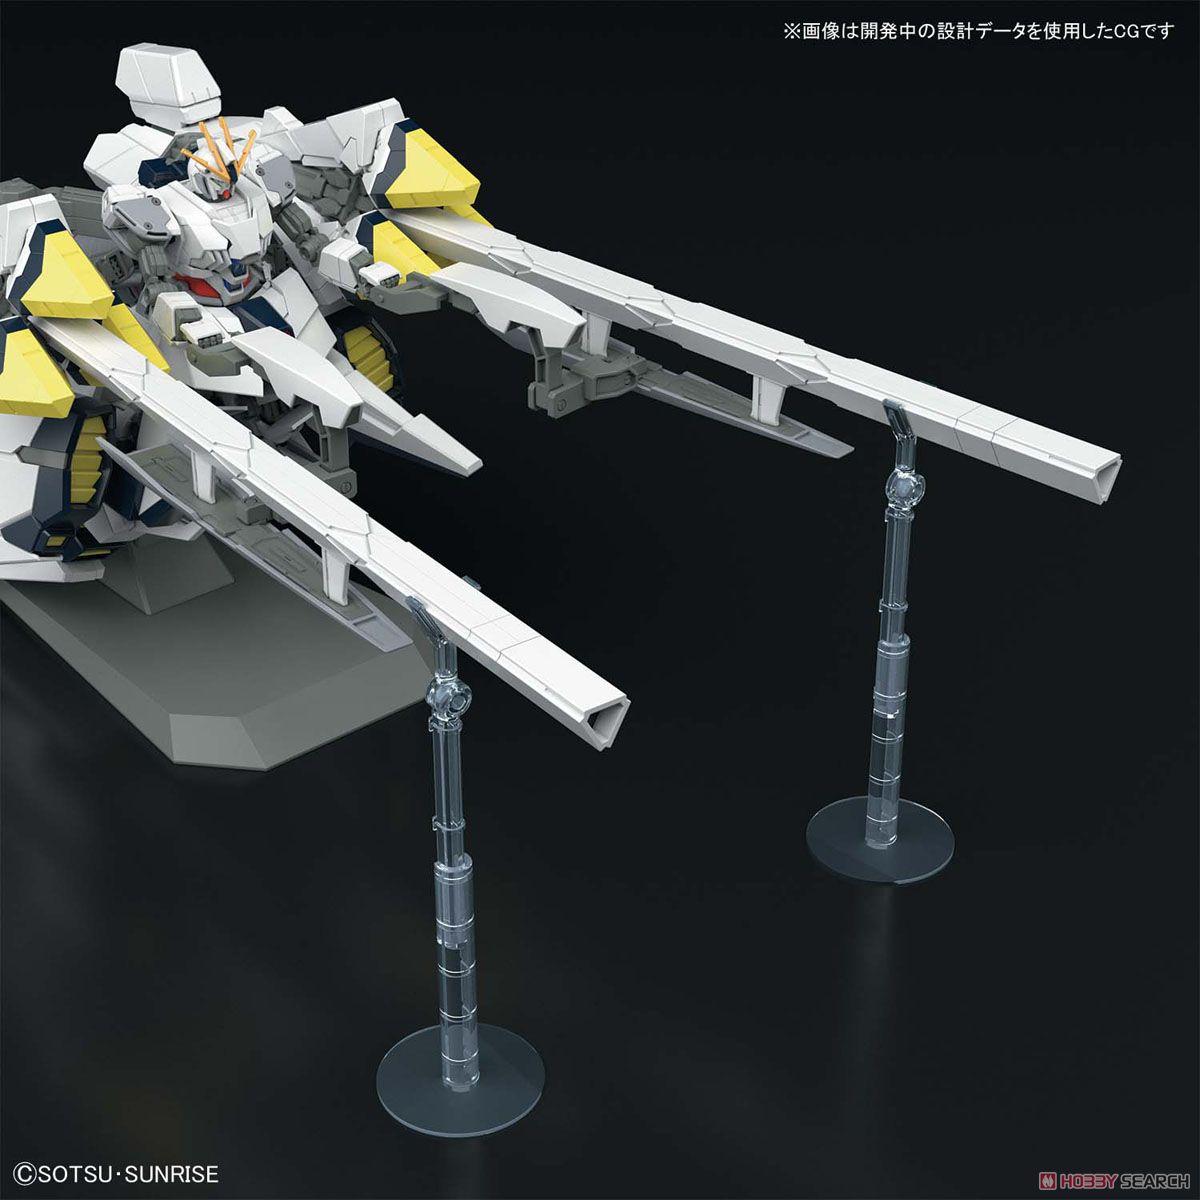 HGUC『ナラティブガンダム A装備』ガンダムNT 1/144 プラモデル-014